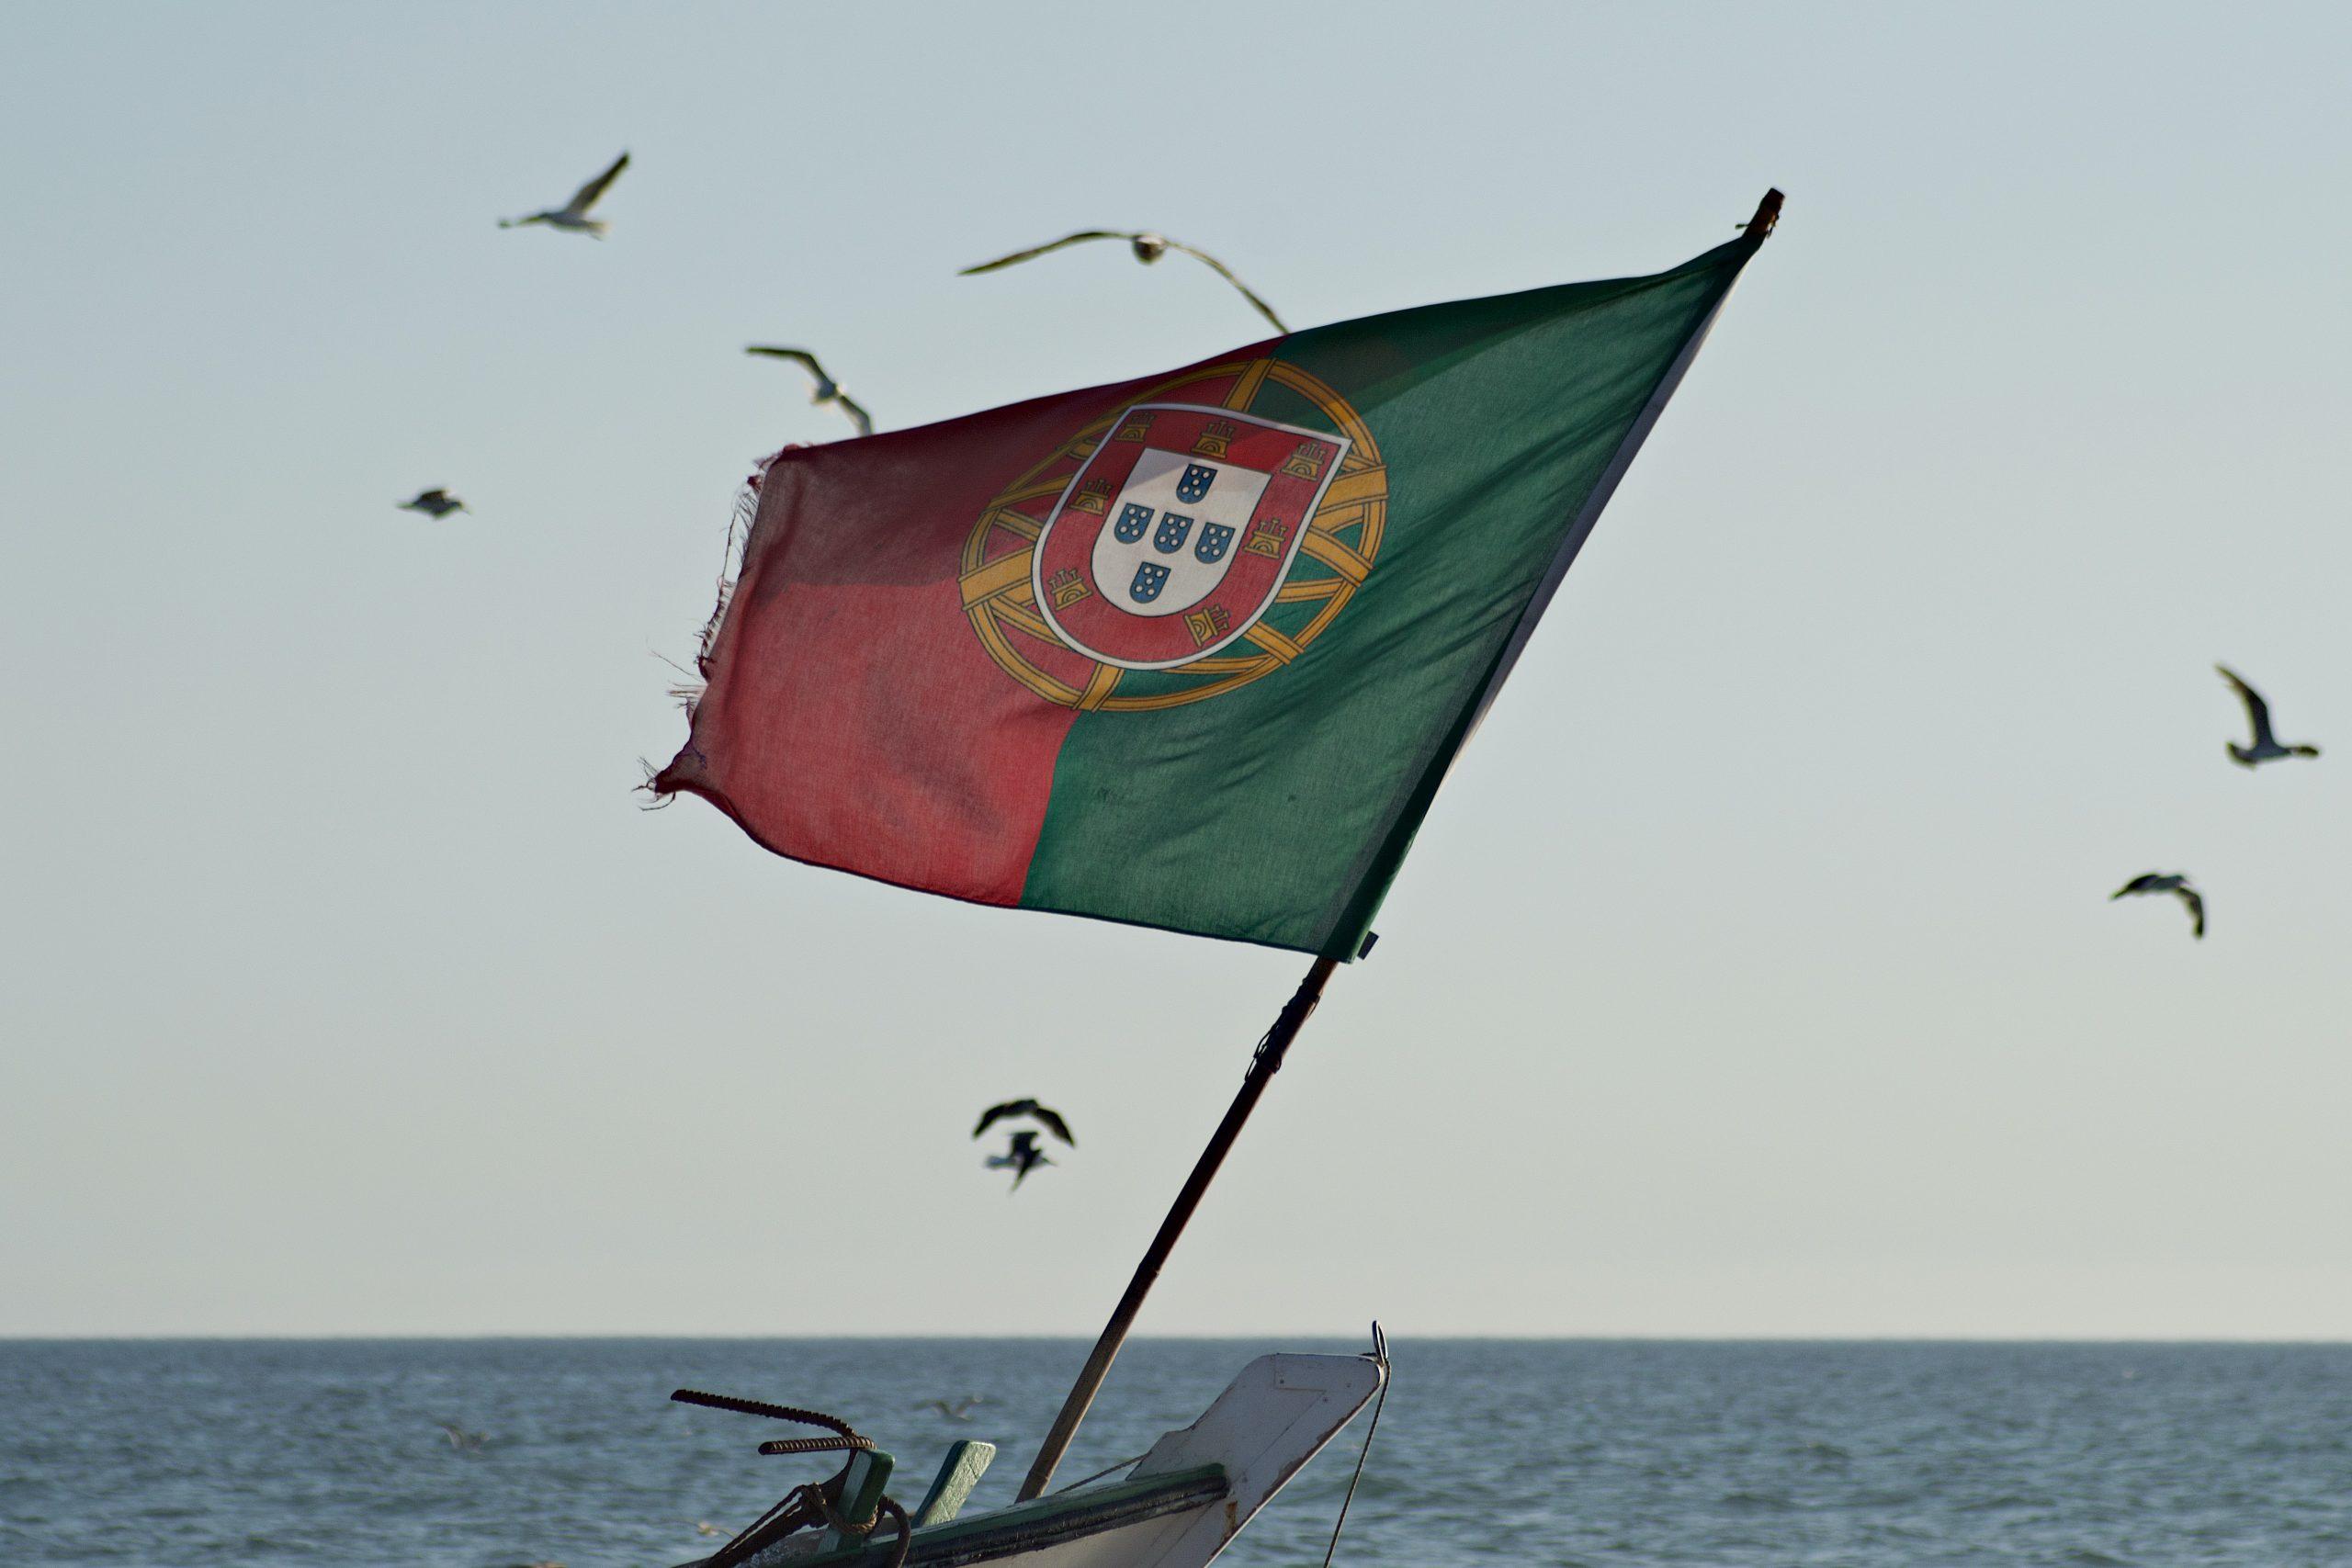 portugal bandeira gaivotas saude portugueses